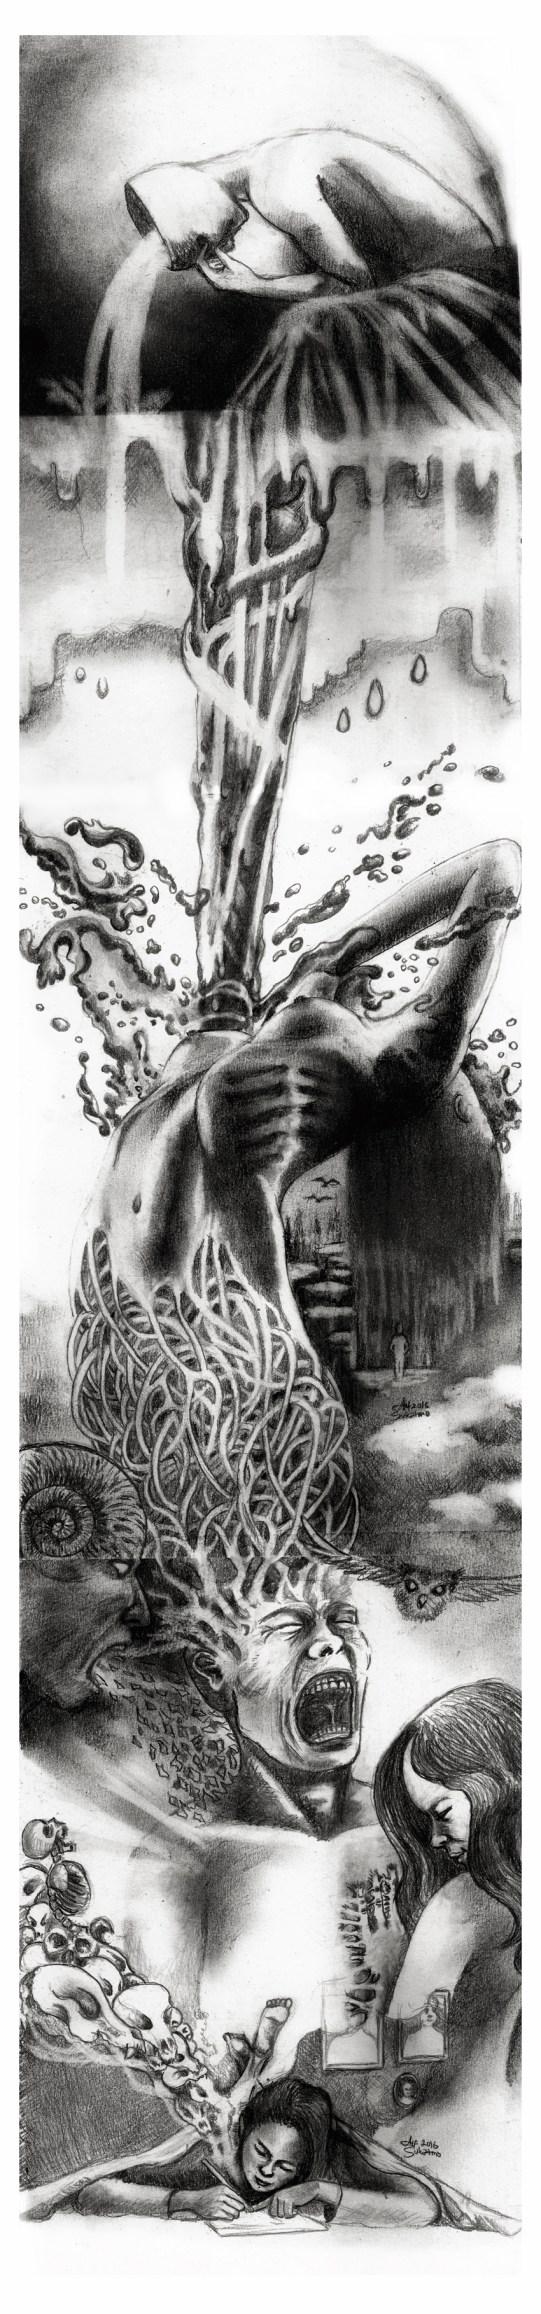 """Histórica: Paranoia"" Pencil, charcoal on paper ©Alf Sukatmo. 2016"